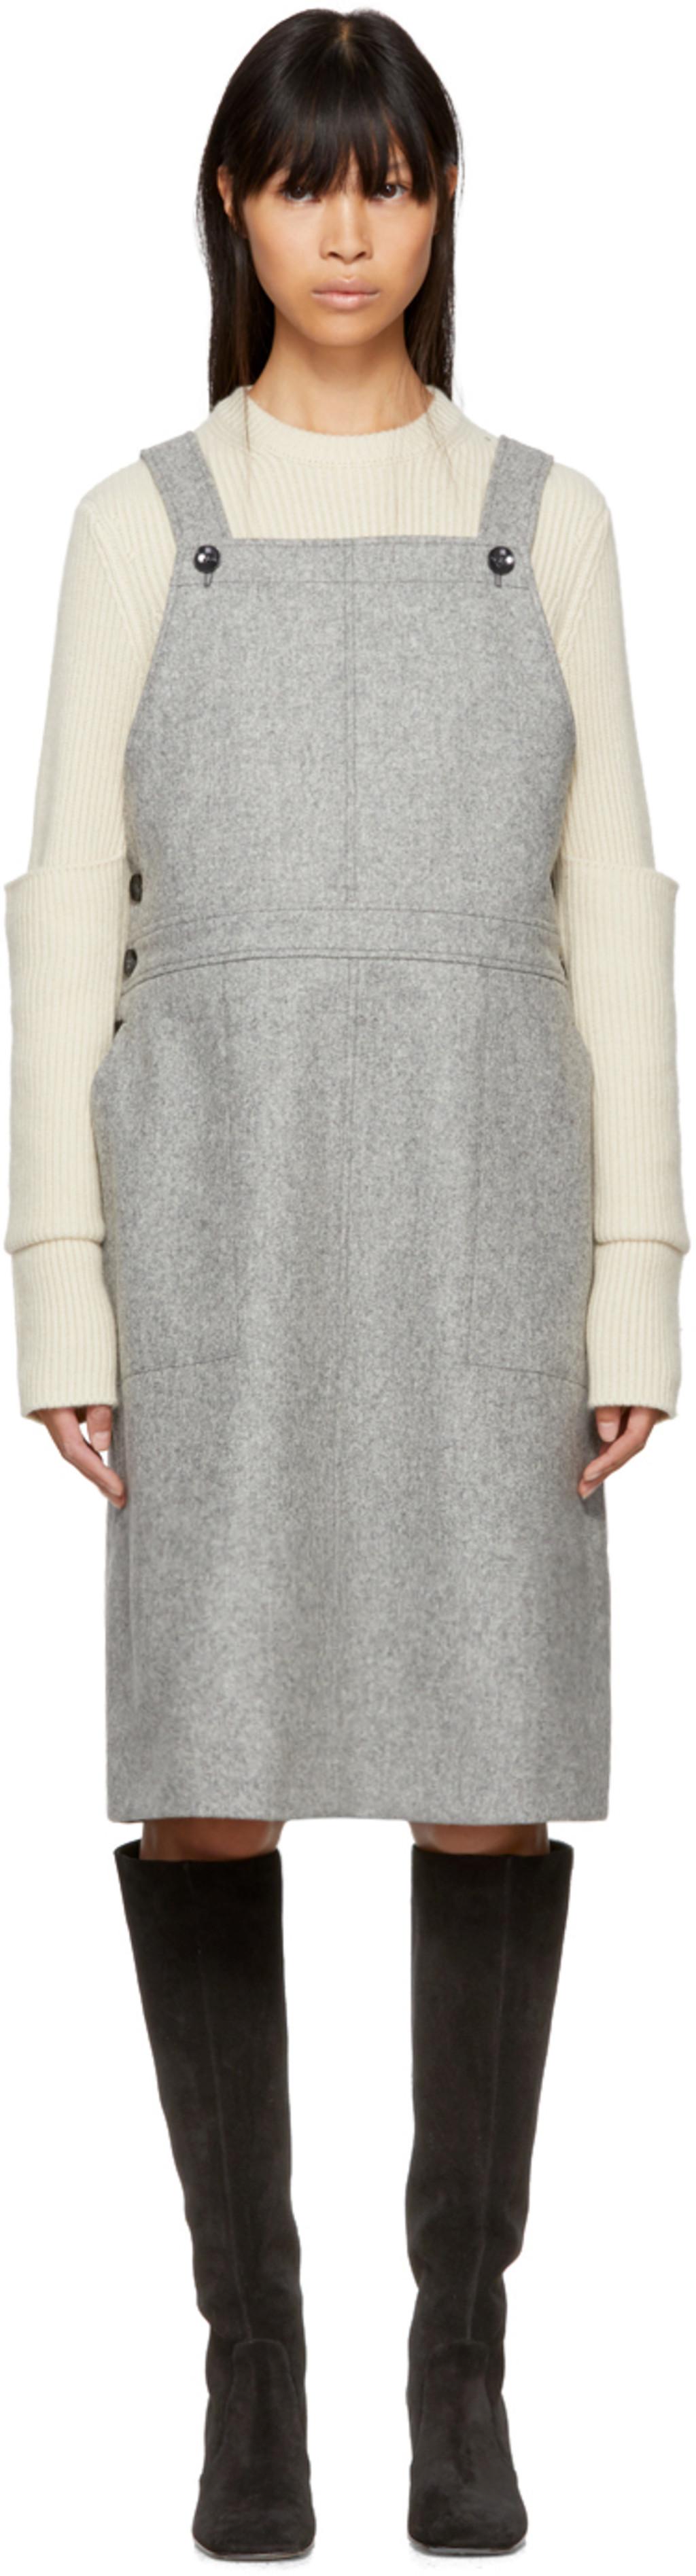 Grey Anni Dress Ymc You Must Create IGSNu